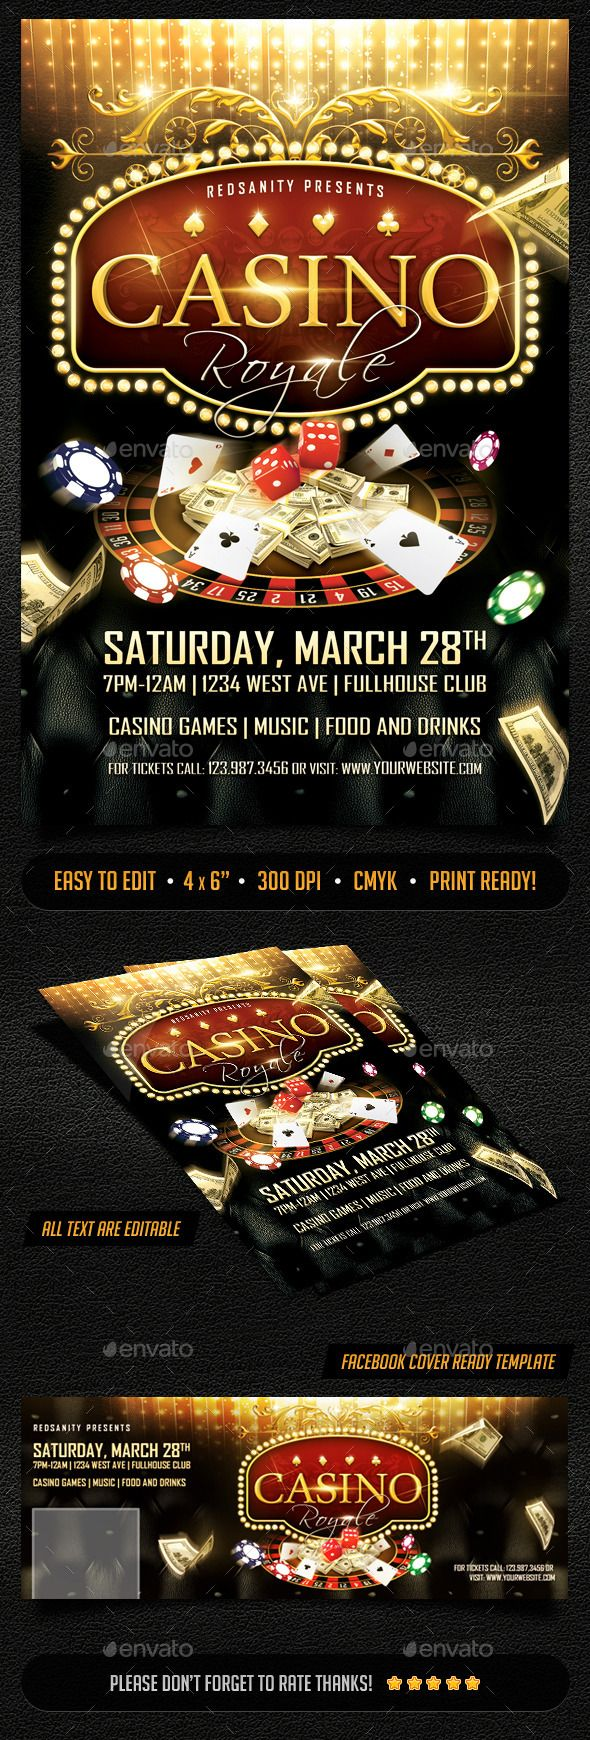 Casino Royale Flyer Plus FB Cover | Casino Infographics